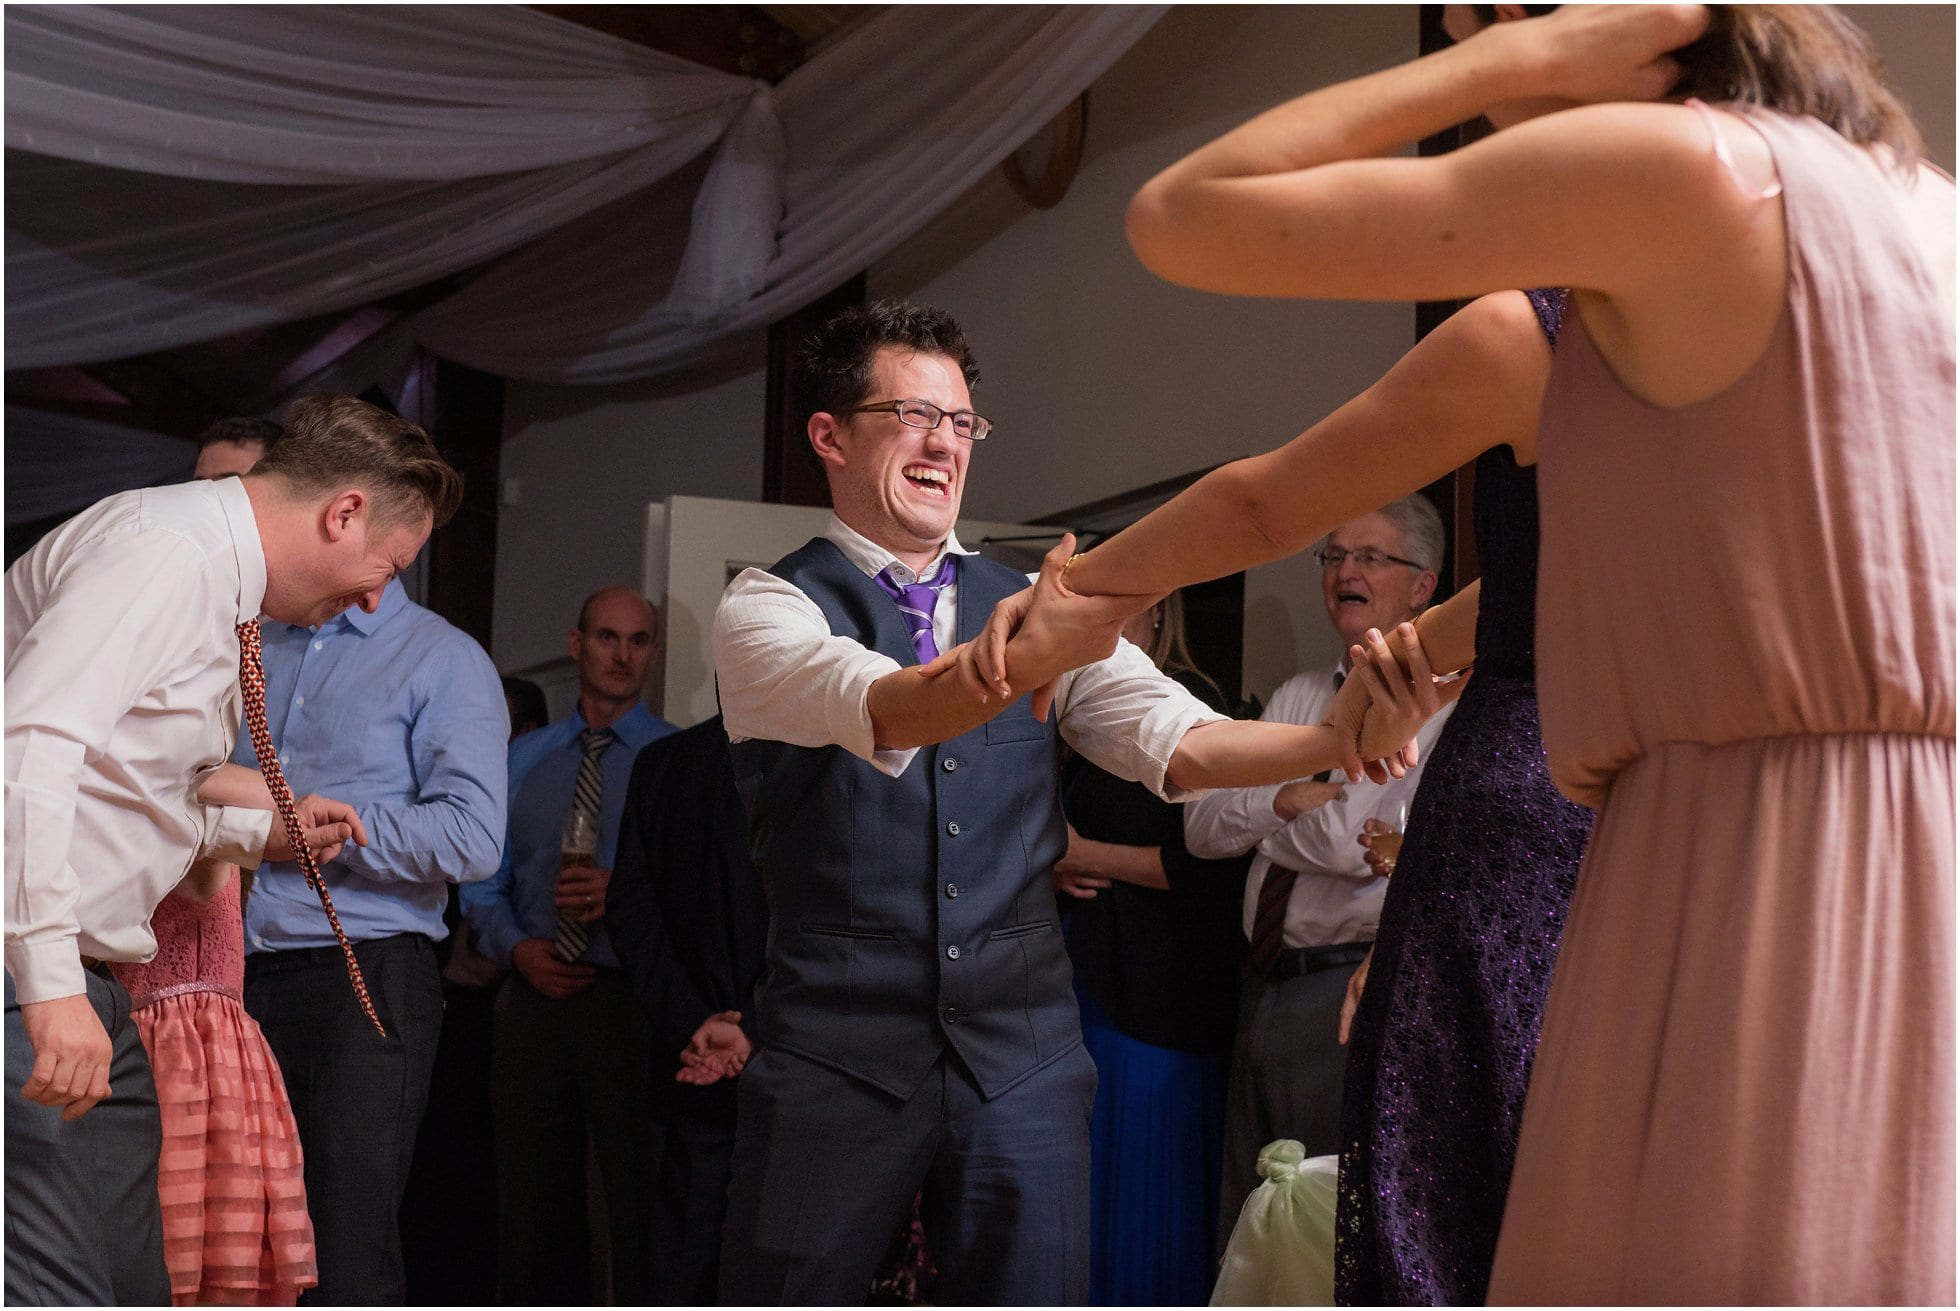 Guest really enjoying the wedding reception